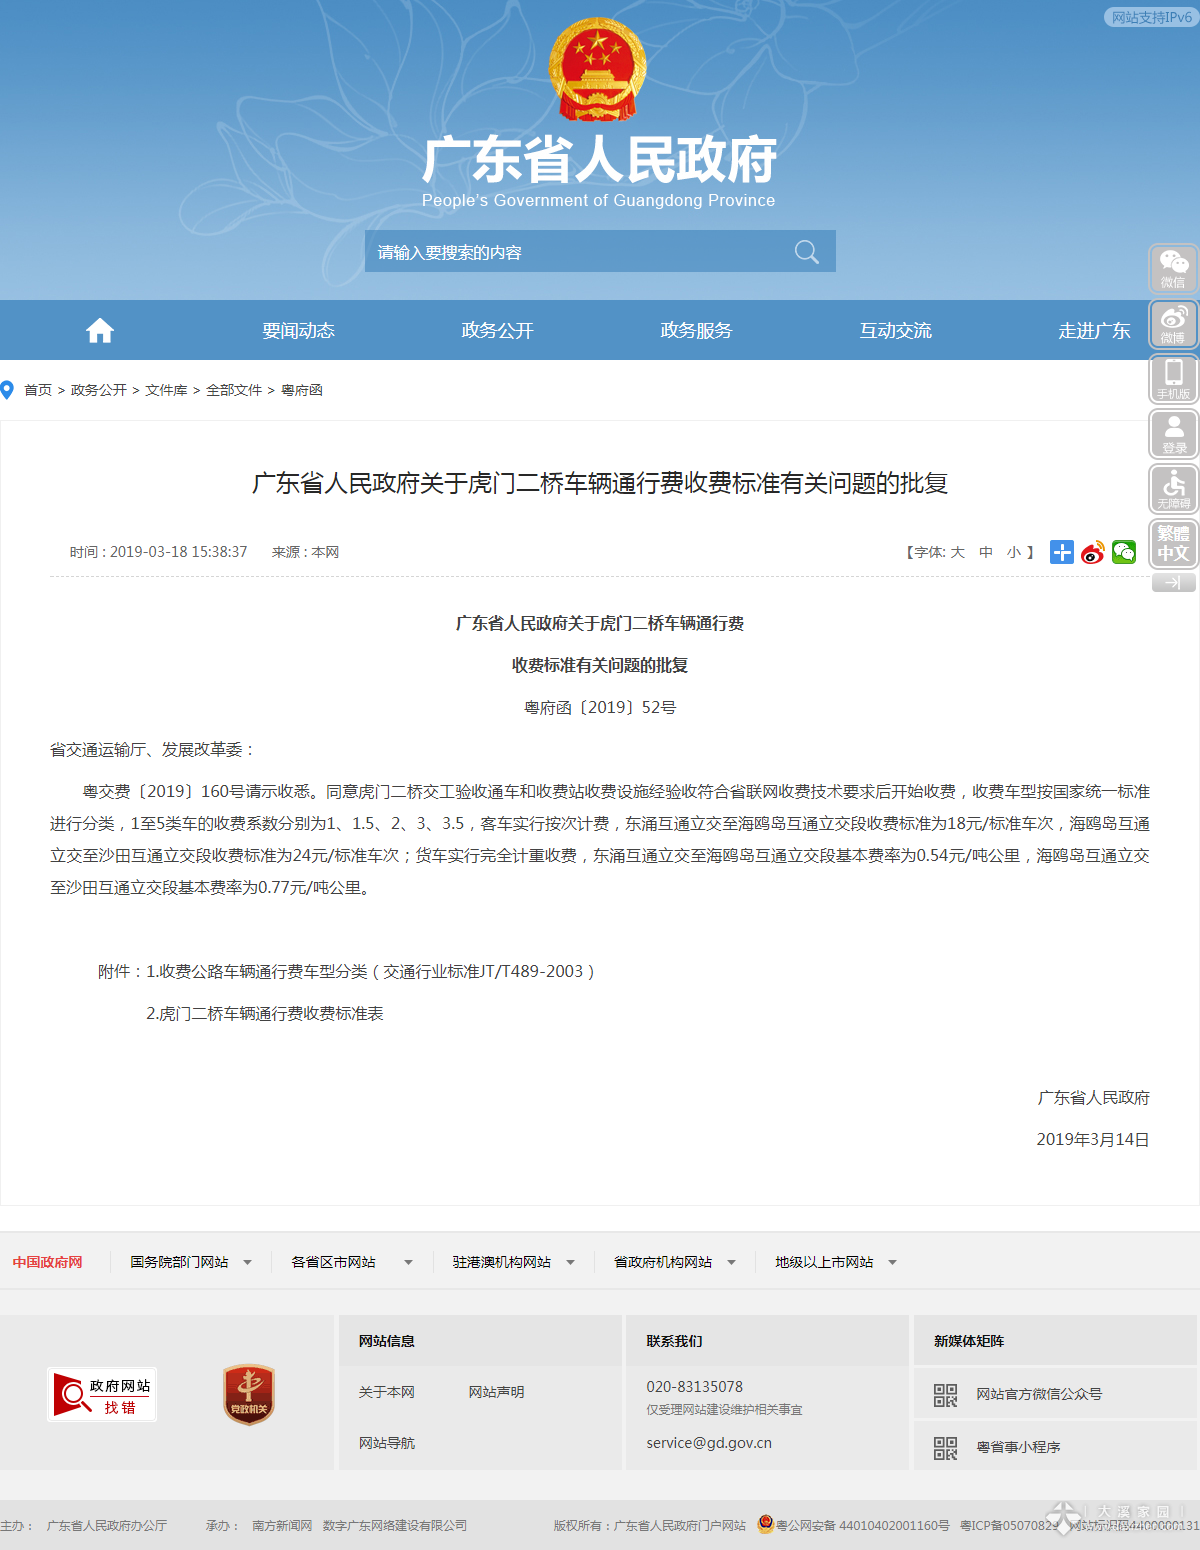 www.gd.gov.cn_zwgk_wjk_qbwj_yfh_content_post_2225882.html.png